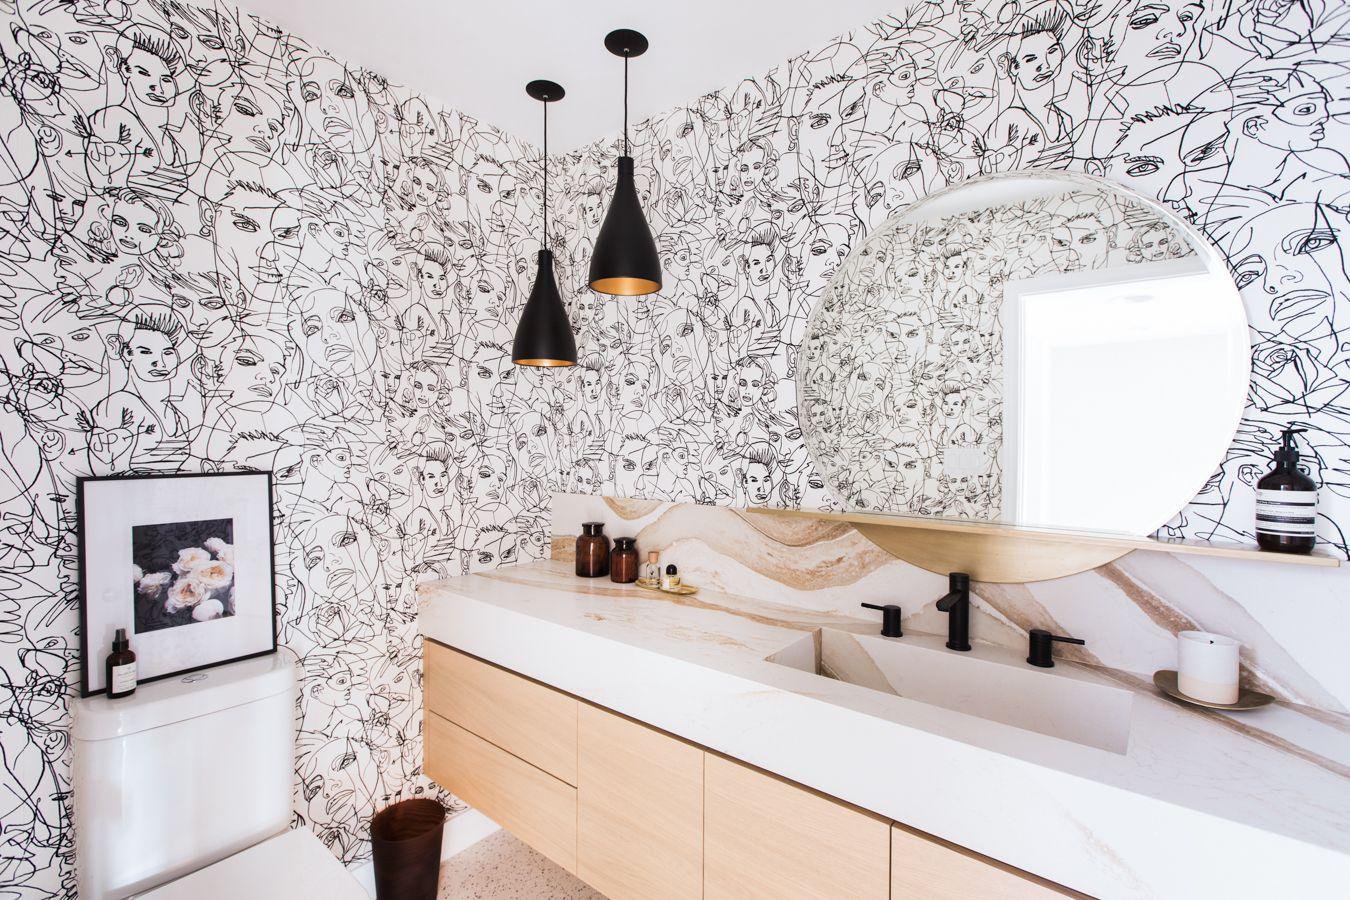 53 of the Best Bathroom Design Ideas We've Ever Seen